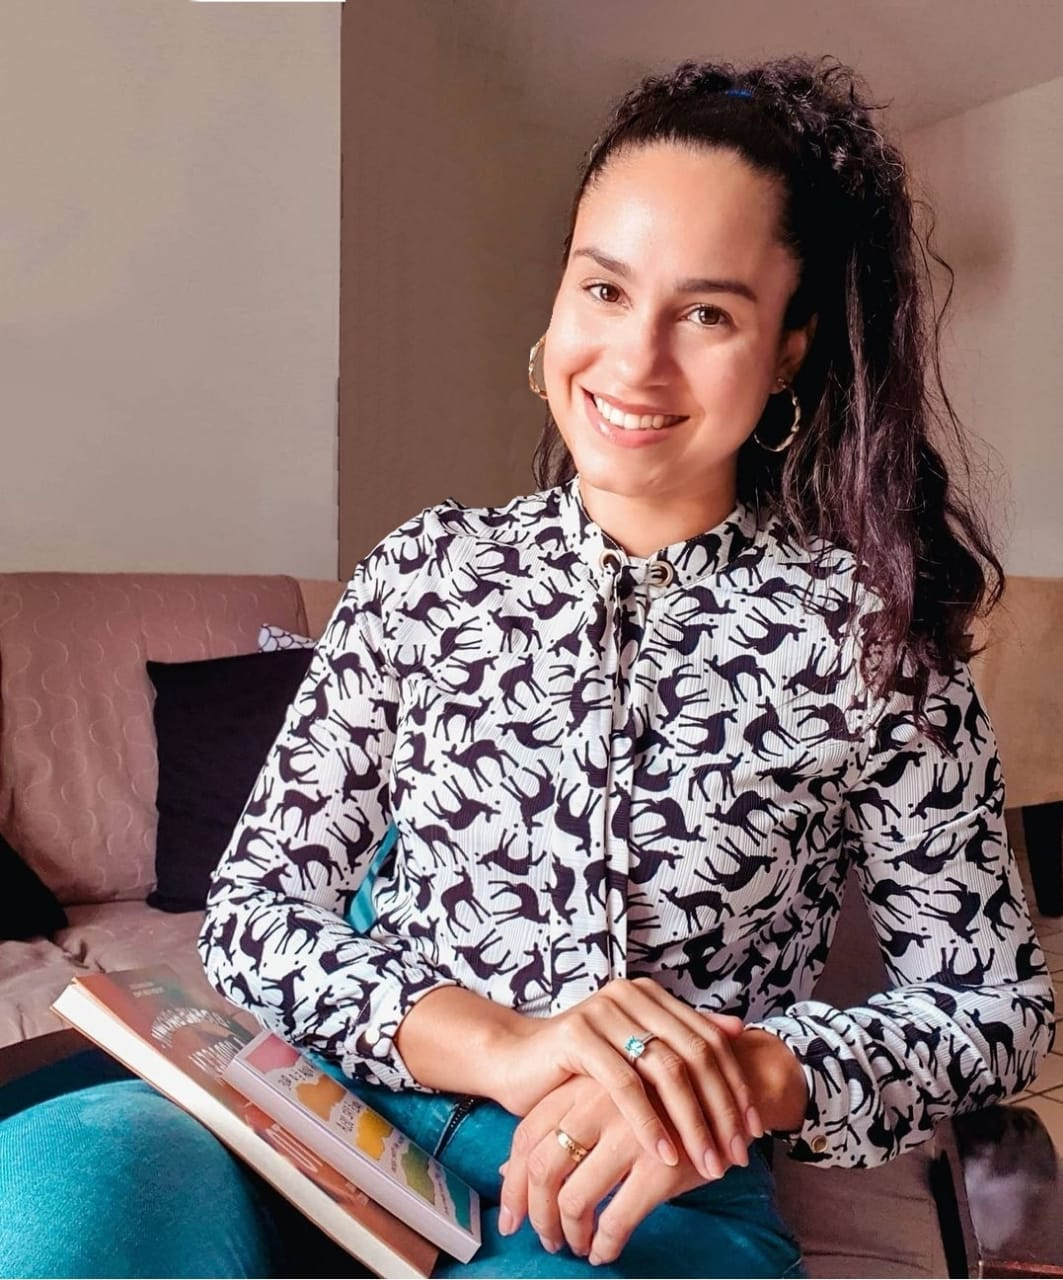 Mariana Morais